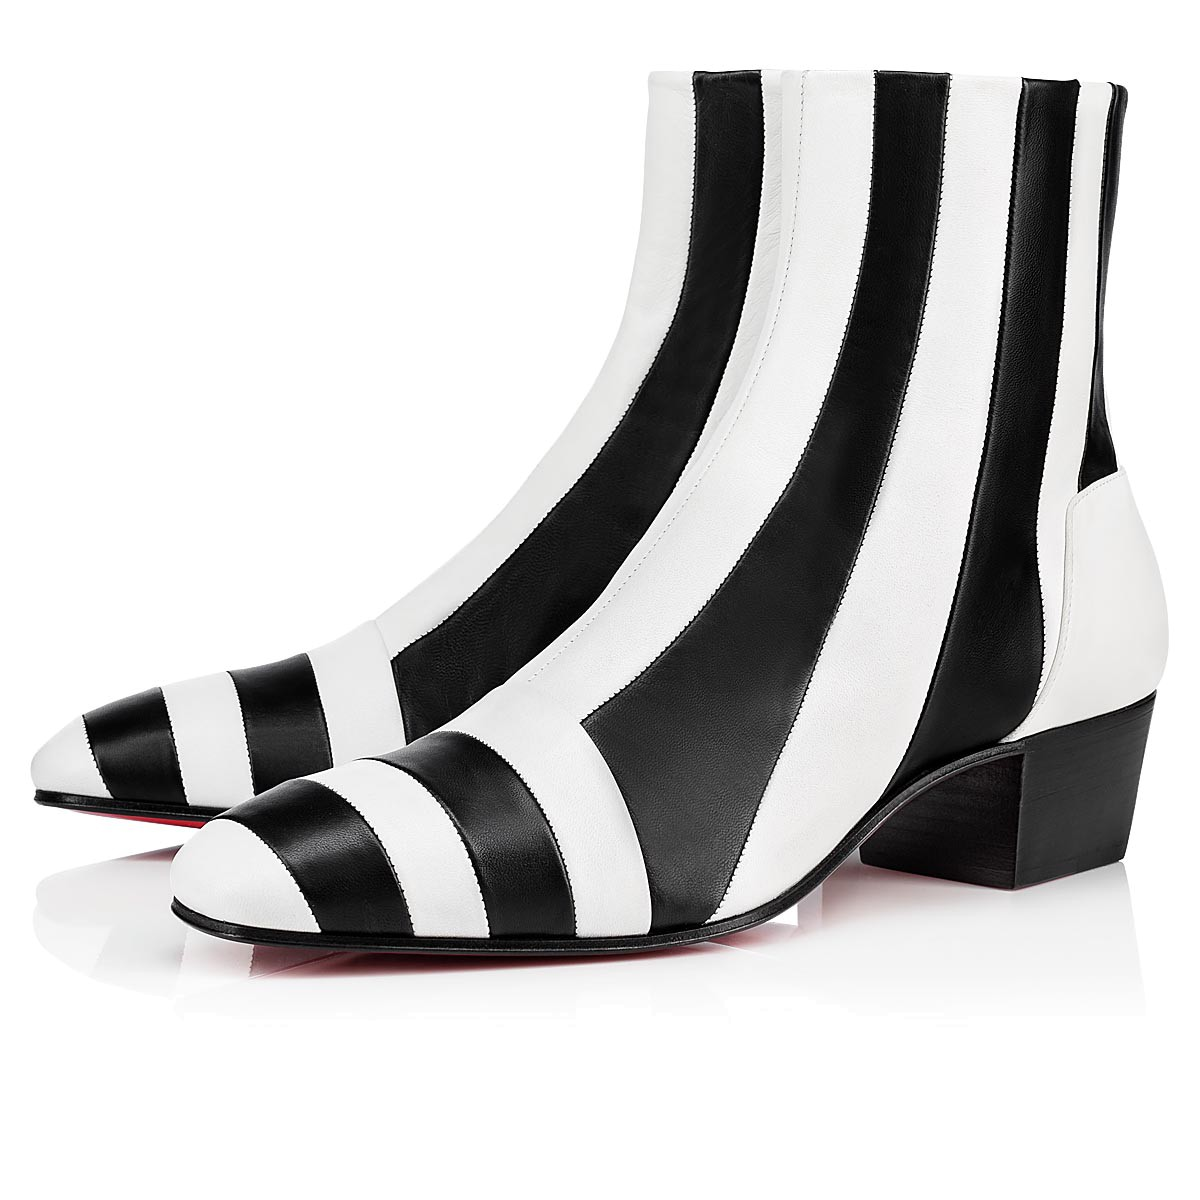 Shoes - The Joker - Christian Louboutin